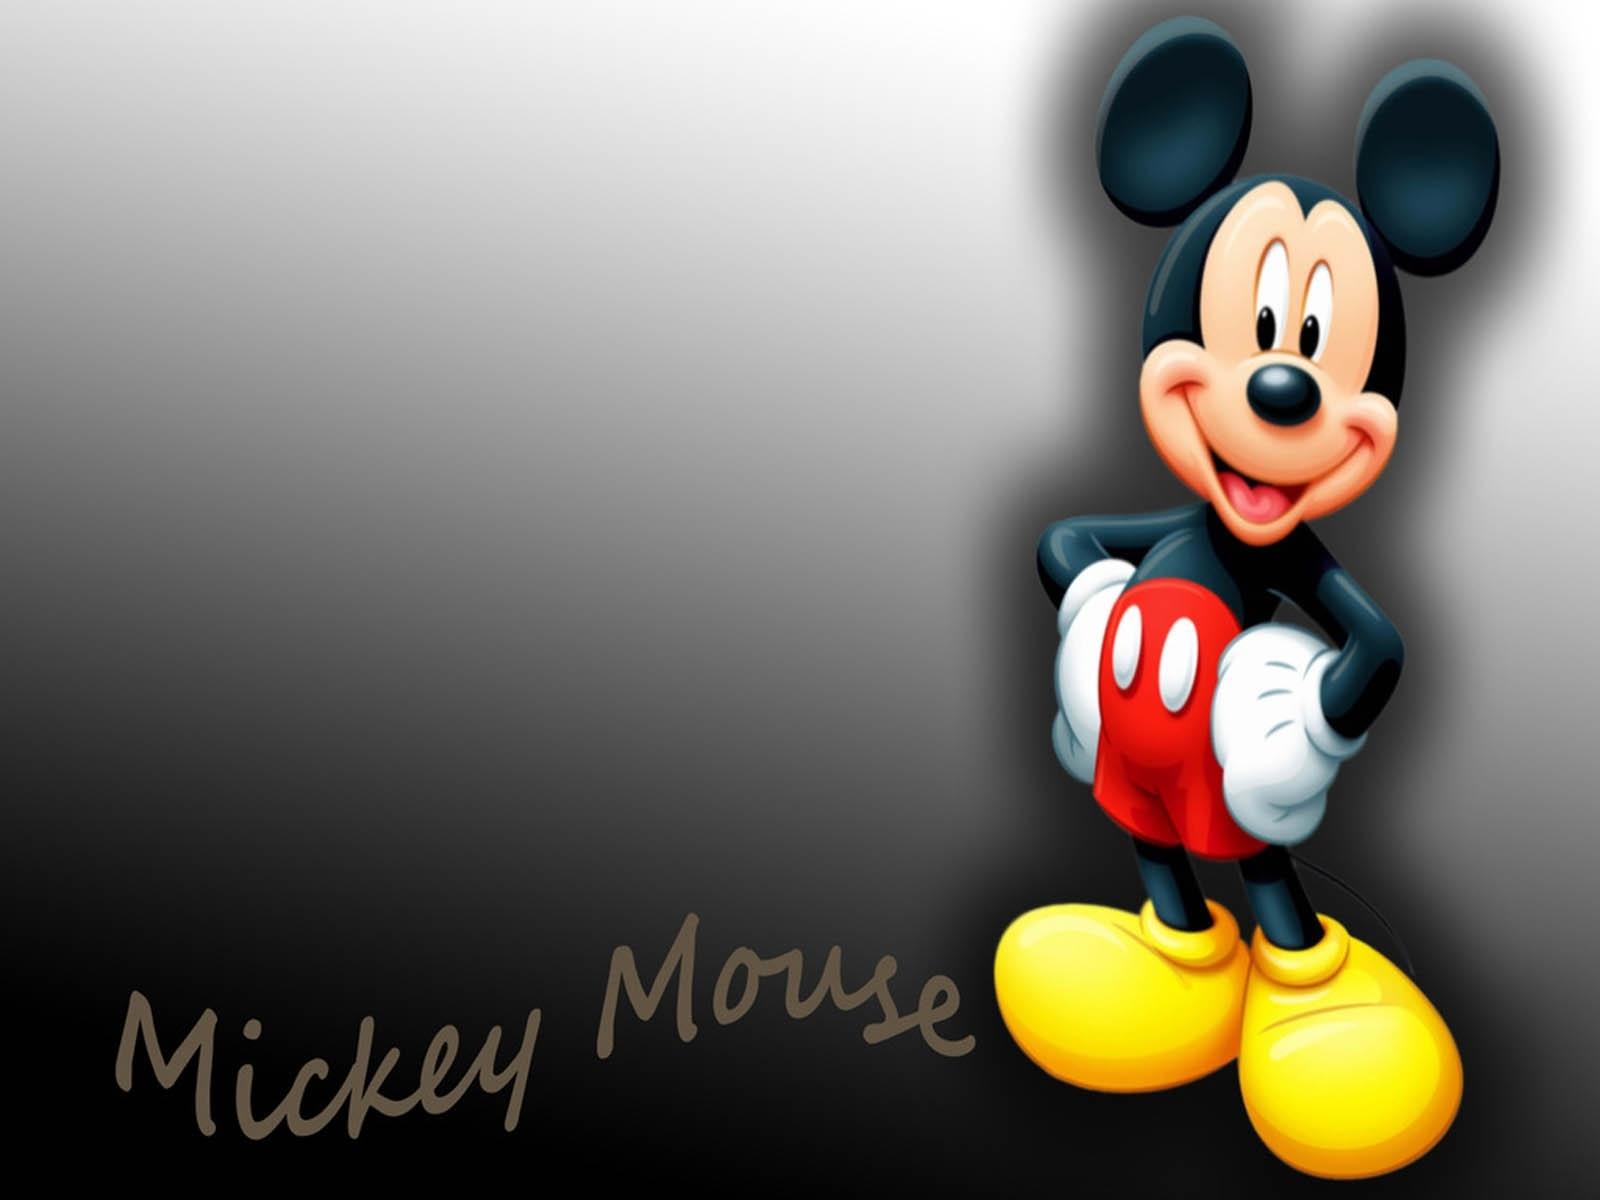 scenery wallpaper: wallpaper mickey mouse